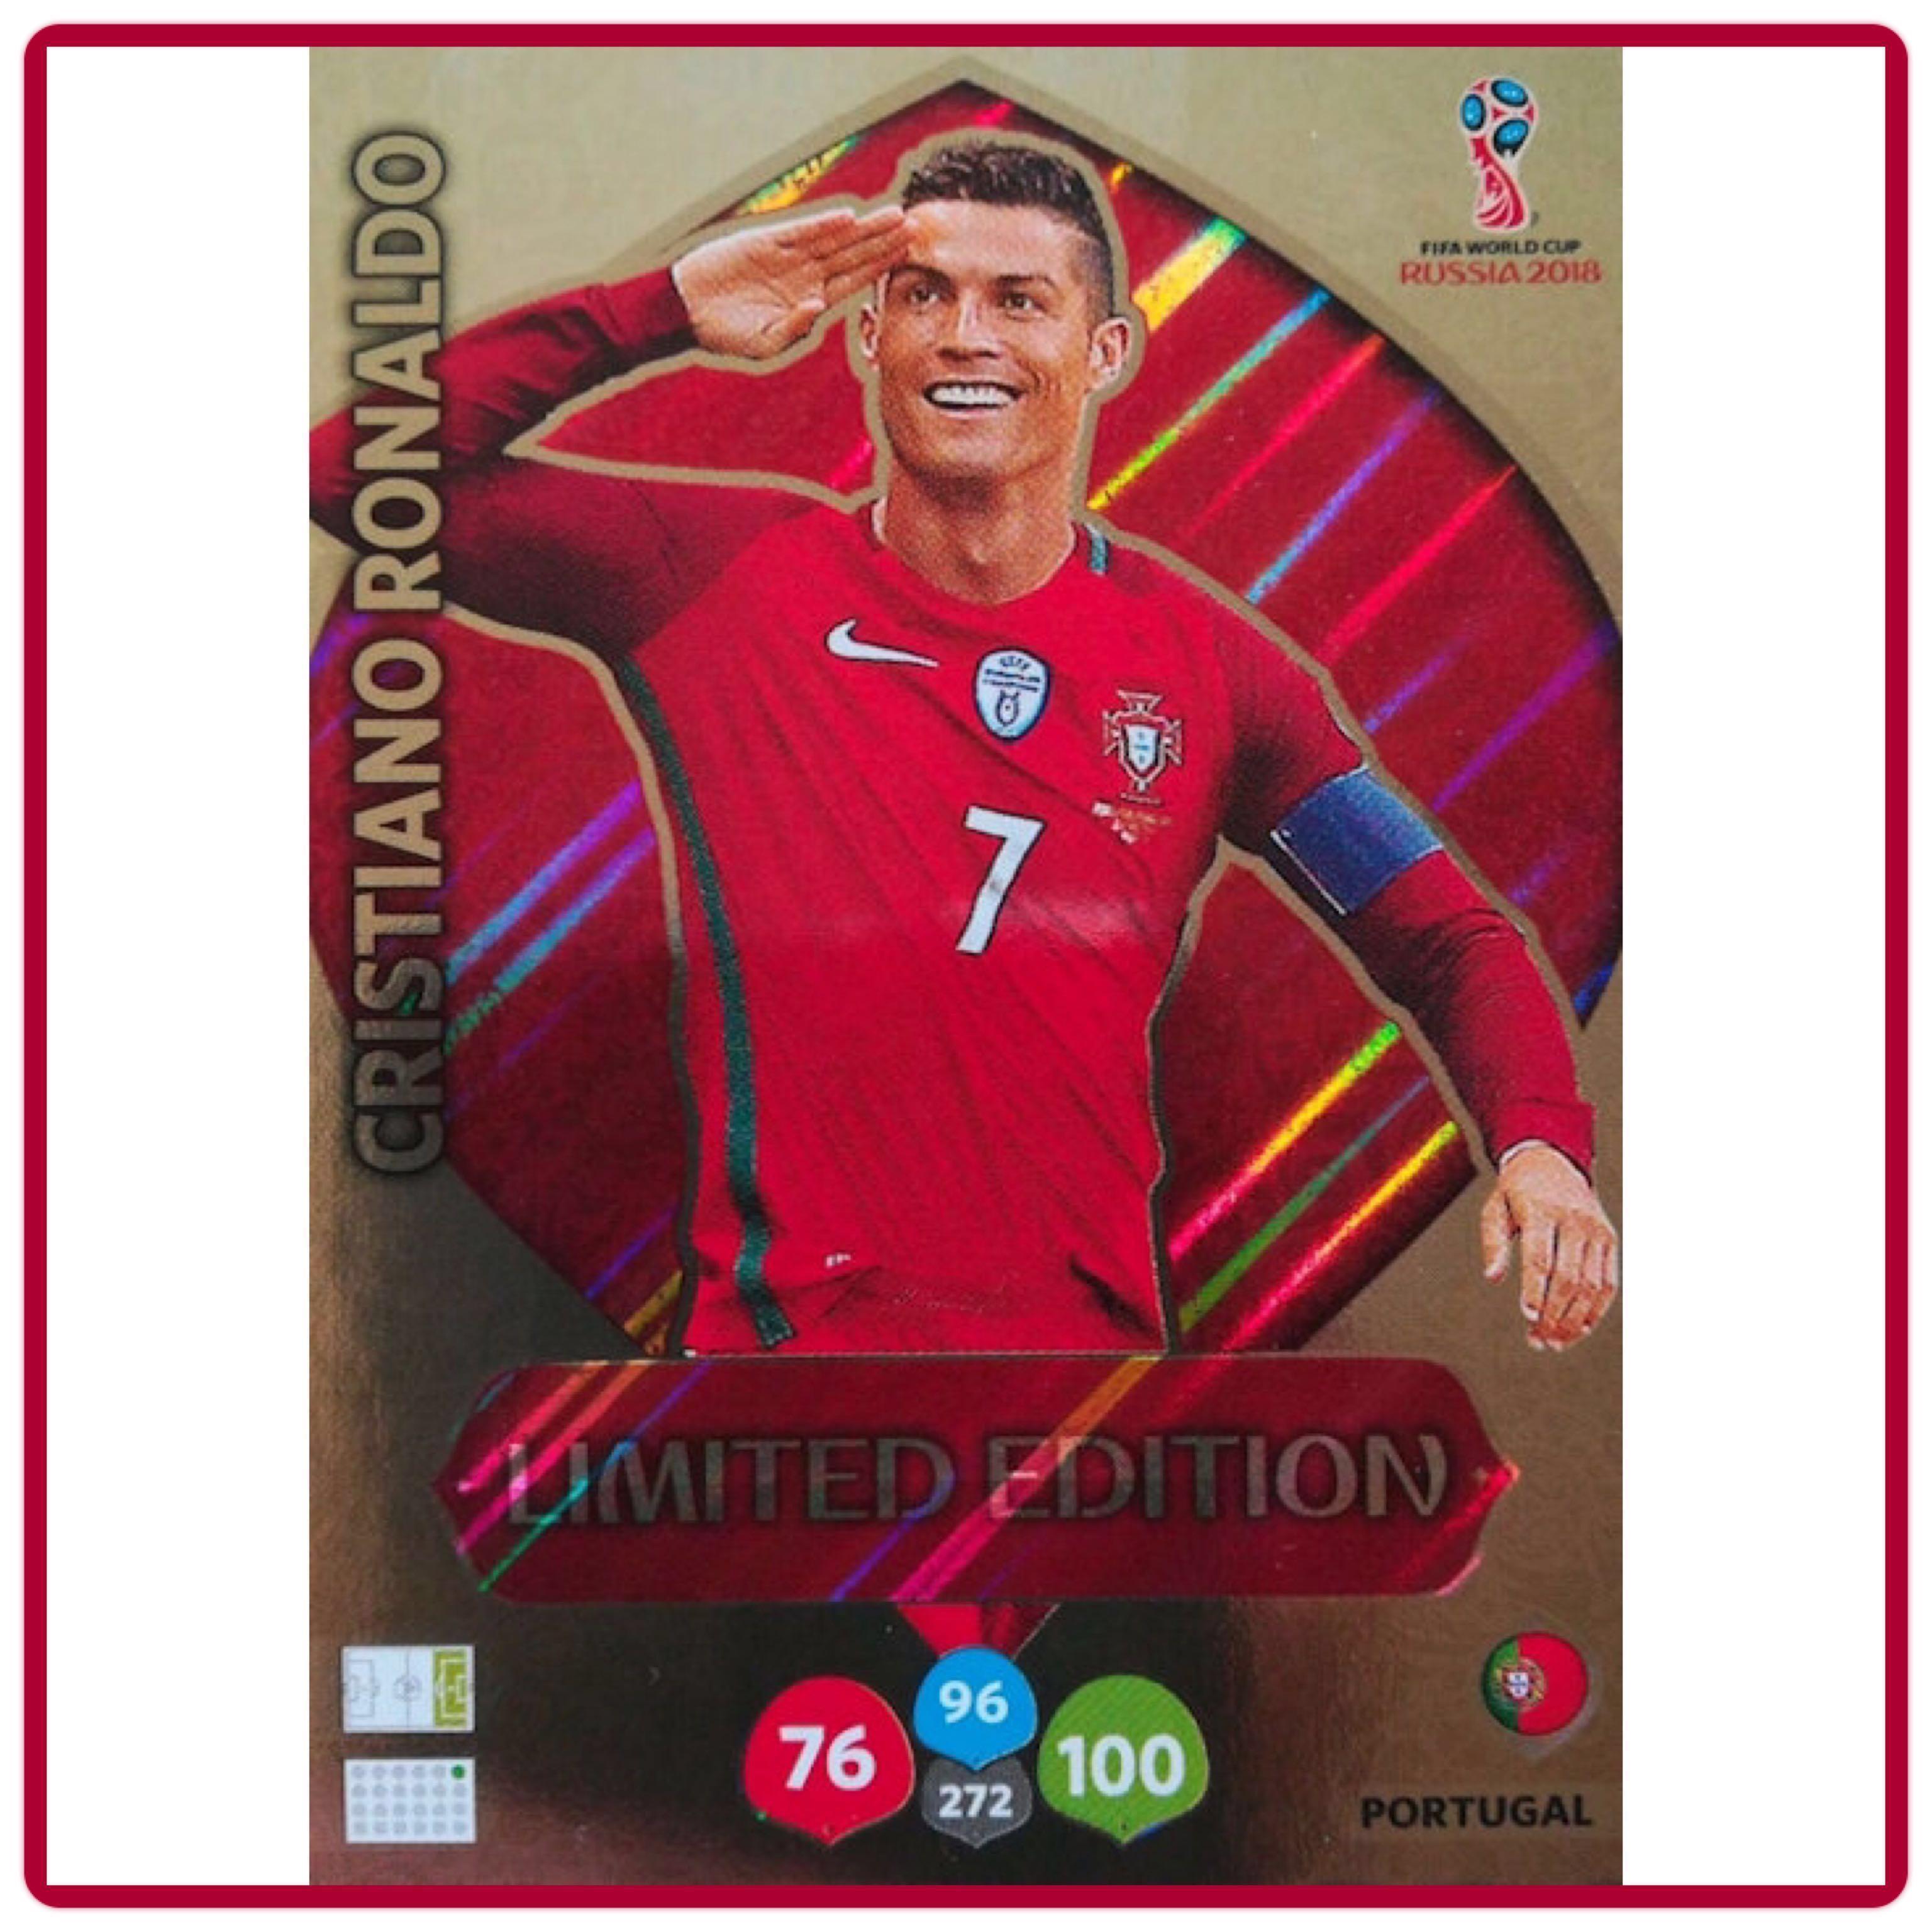 d4b95b4bcfc Panini Adrenalyn XL World Cup Russia 2018 Cristiano Ronaldo Limited Edition  XXL